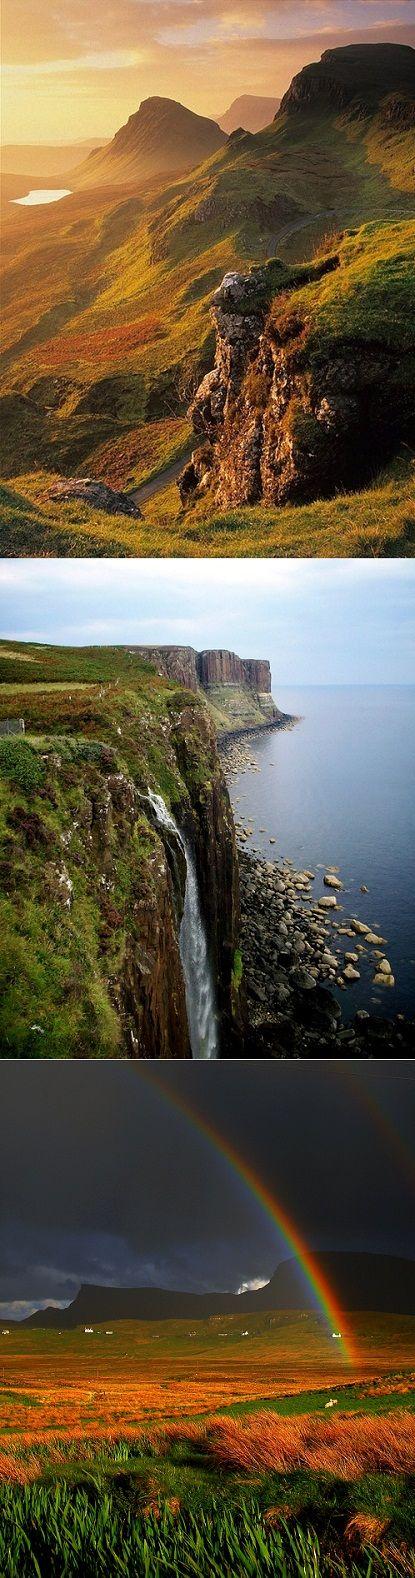 exPress-o: Travel Fantasy: Isle of Skye, Scotland